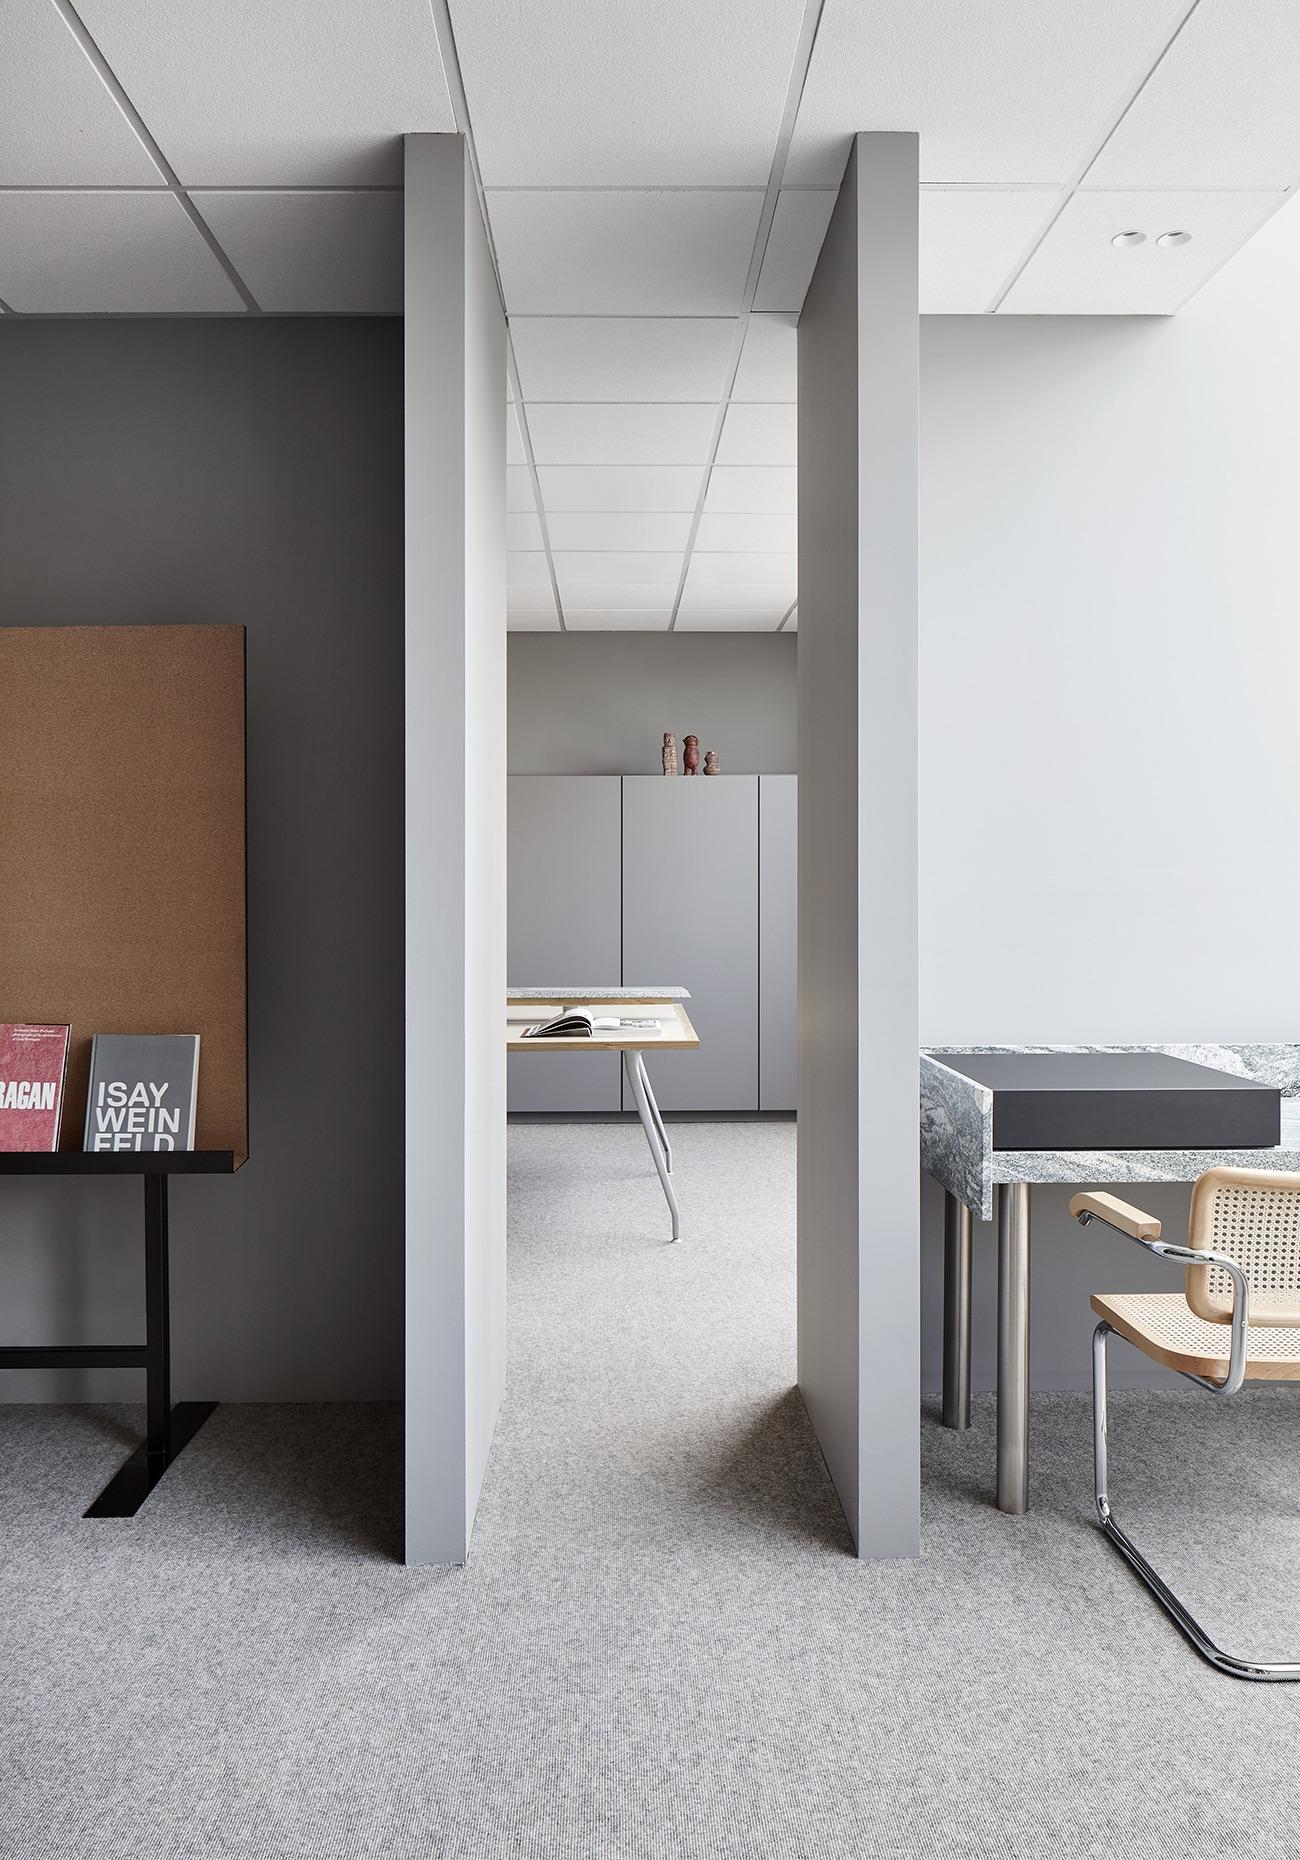 davidov-architects-studio-office-9